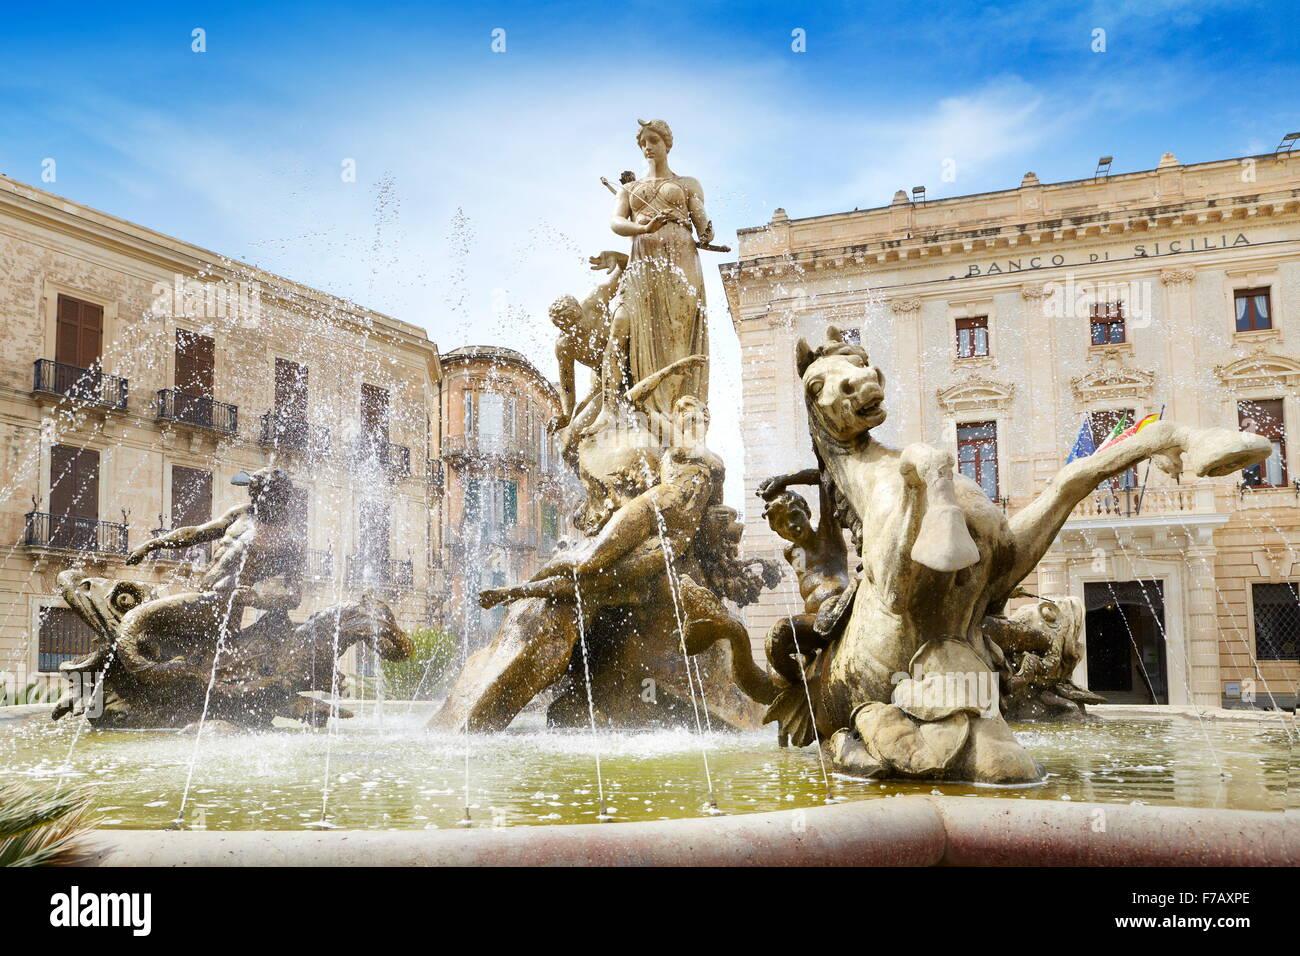 Diana fountain (Fontana di Diana) on the Archimede Square, Ortigia, Syracuse, Sicily, Italy, UNESCO - Stock Image